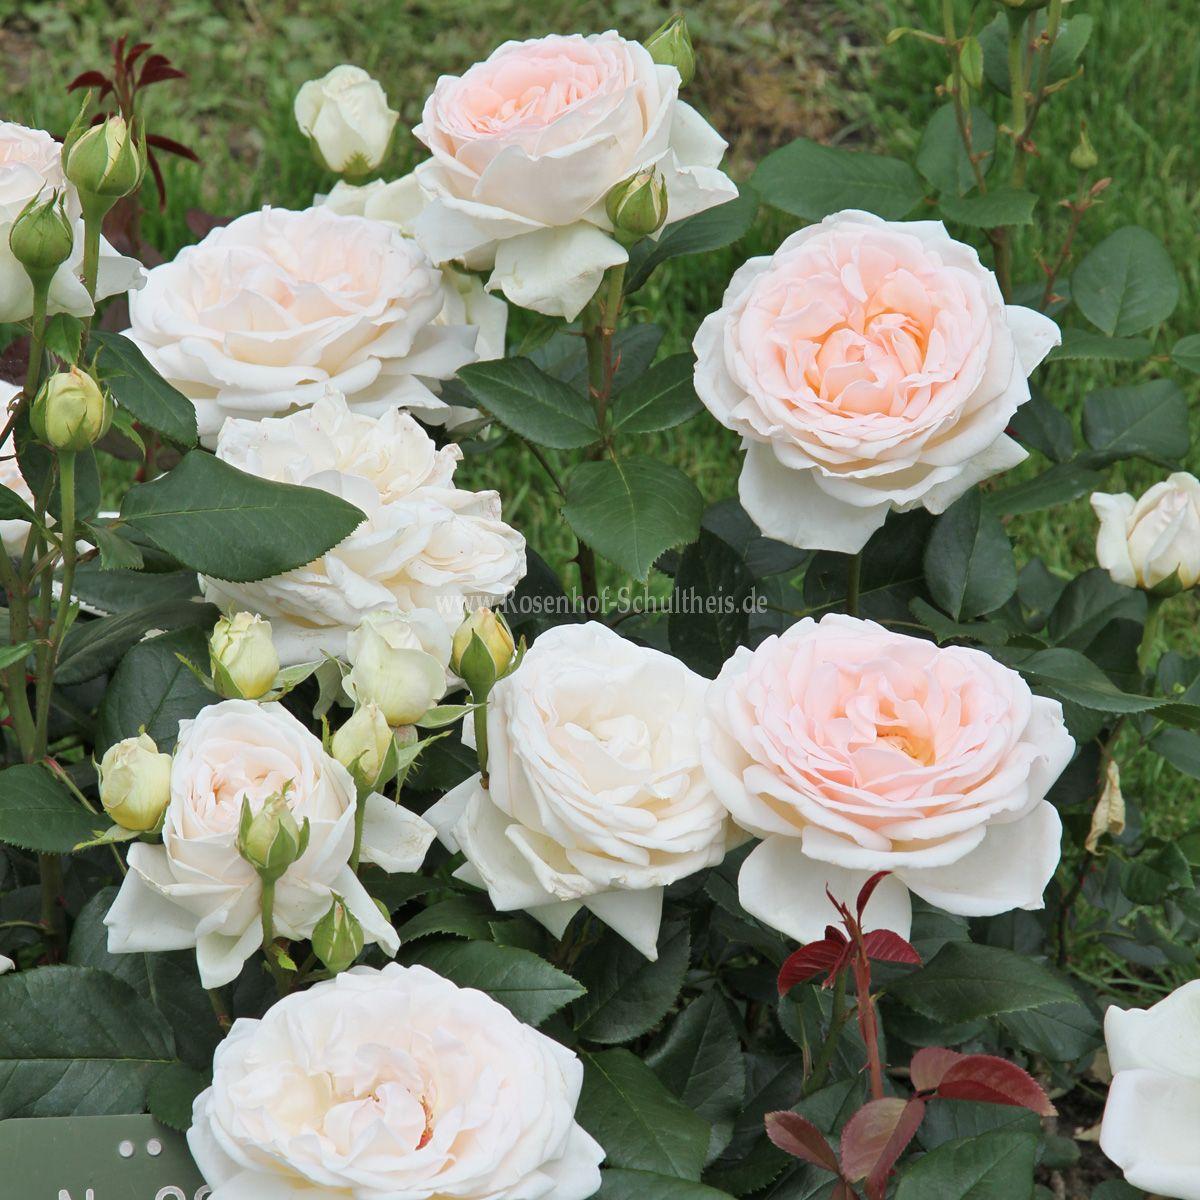 gruaud larose rosen online kaufen im rosenhof schultheis rosen online kaufen im rosenhof. Black Bedroom Furniture Sets. Home Design Ideas